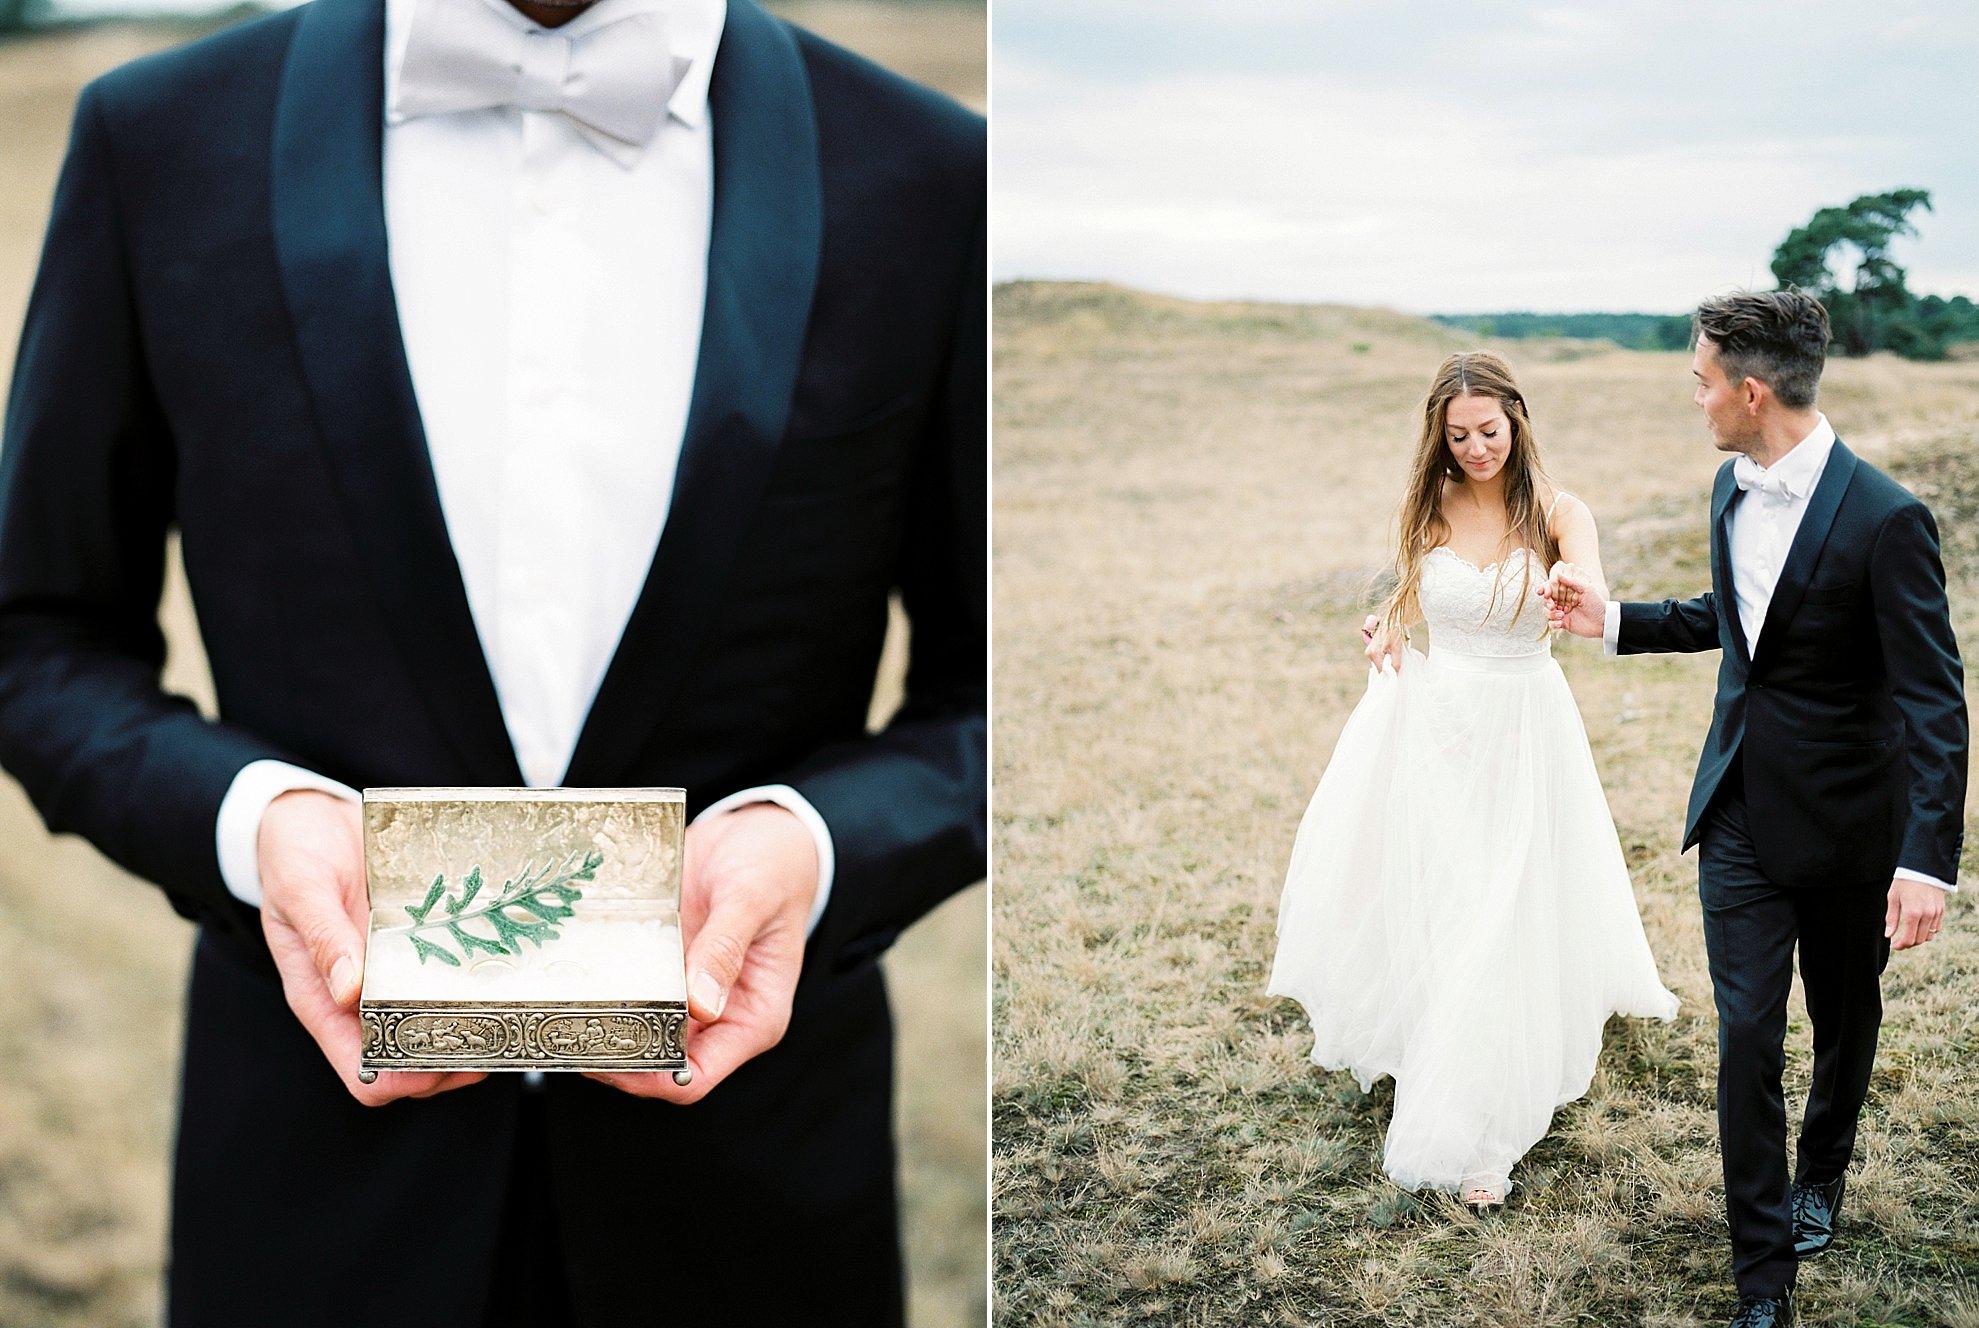 Amanda-Drost-photography-fine-art-nederland-couple-shoot-editorial_0014.jpg